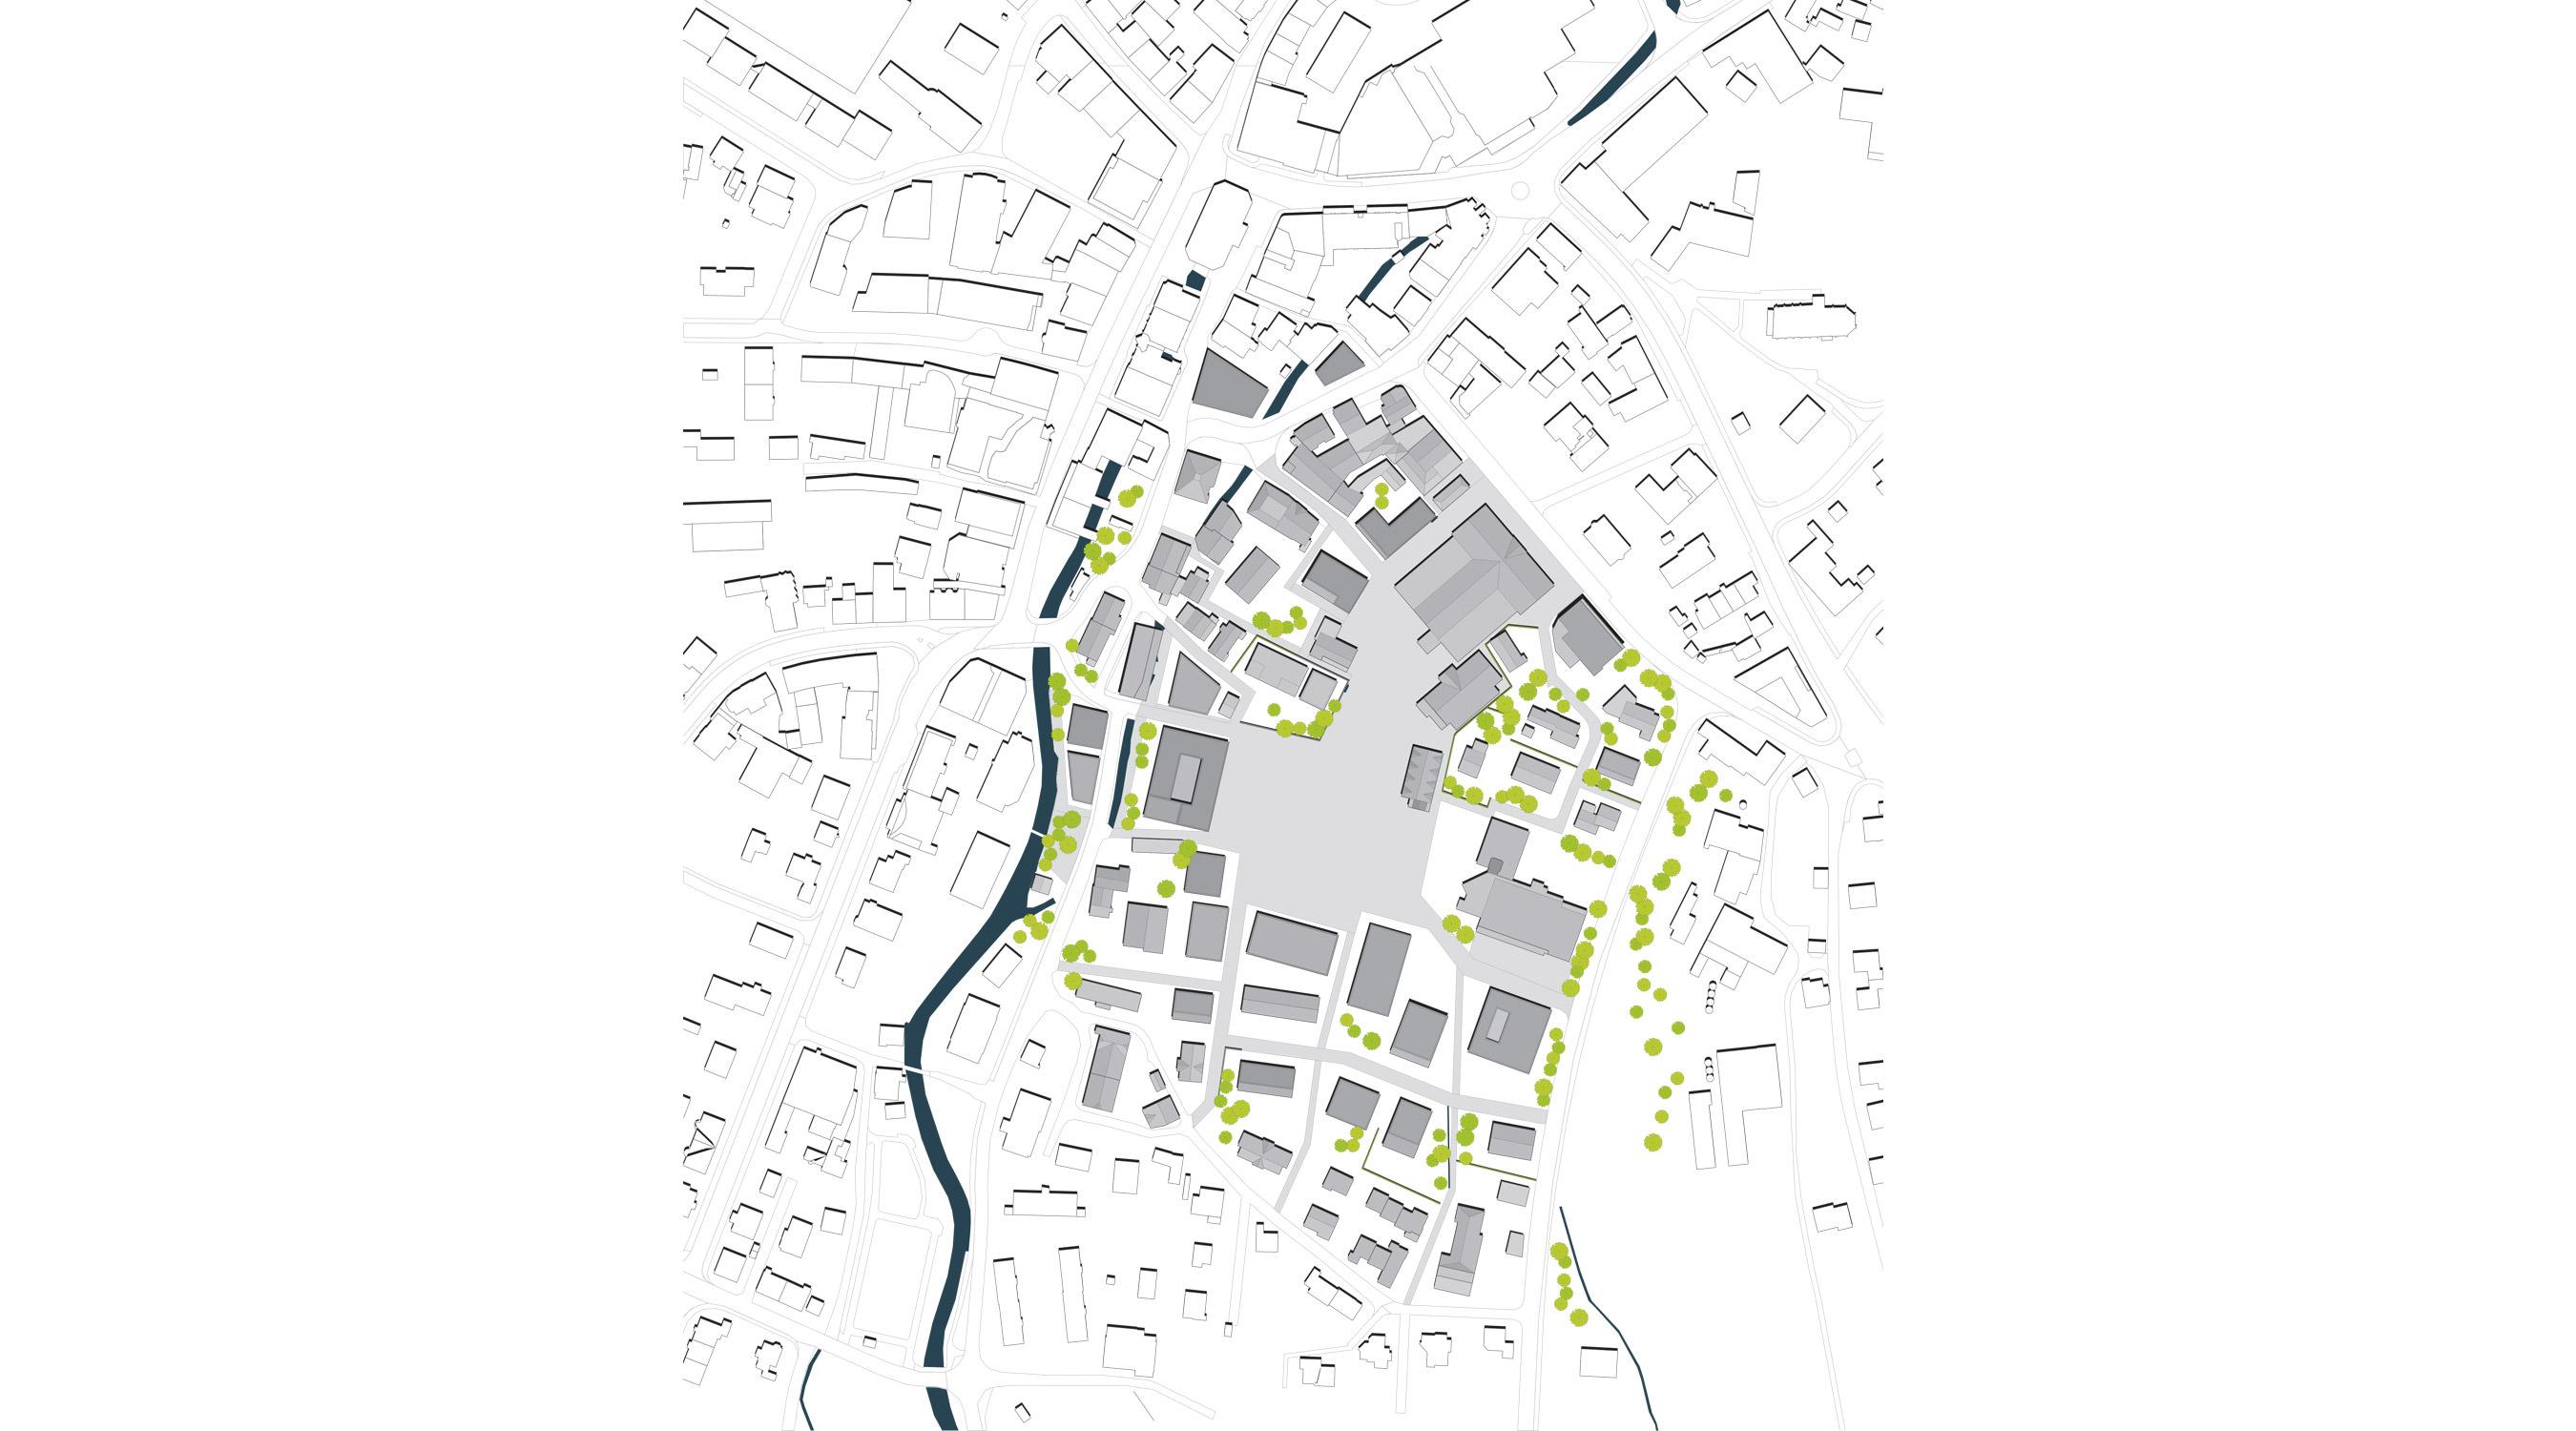 Markhallenareal Langenthal Lageplan